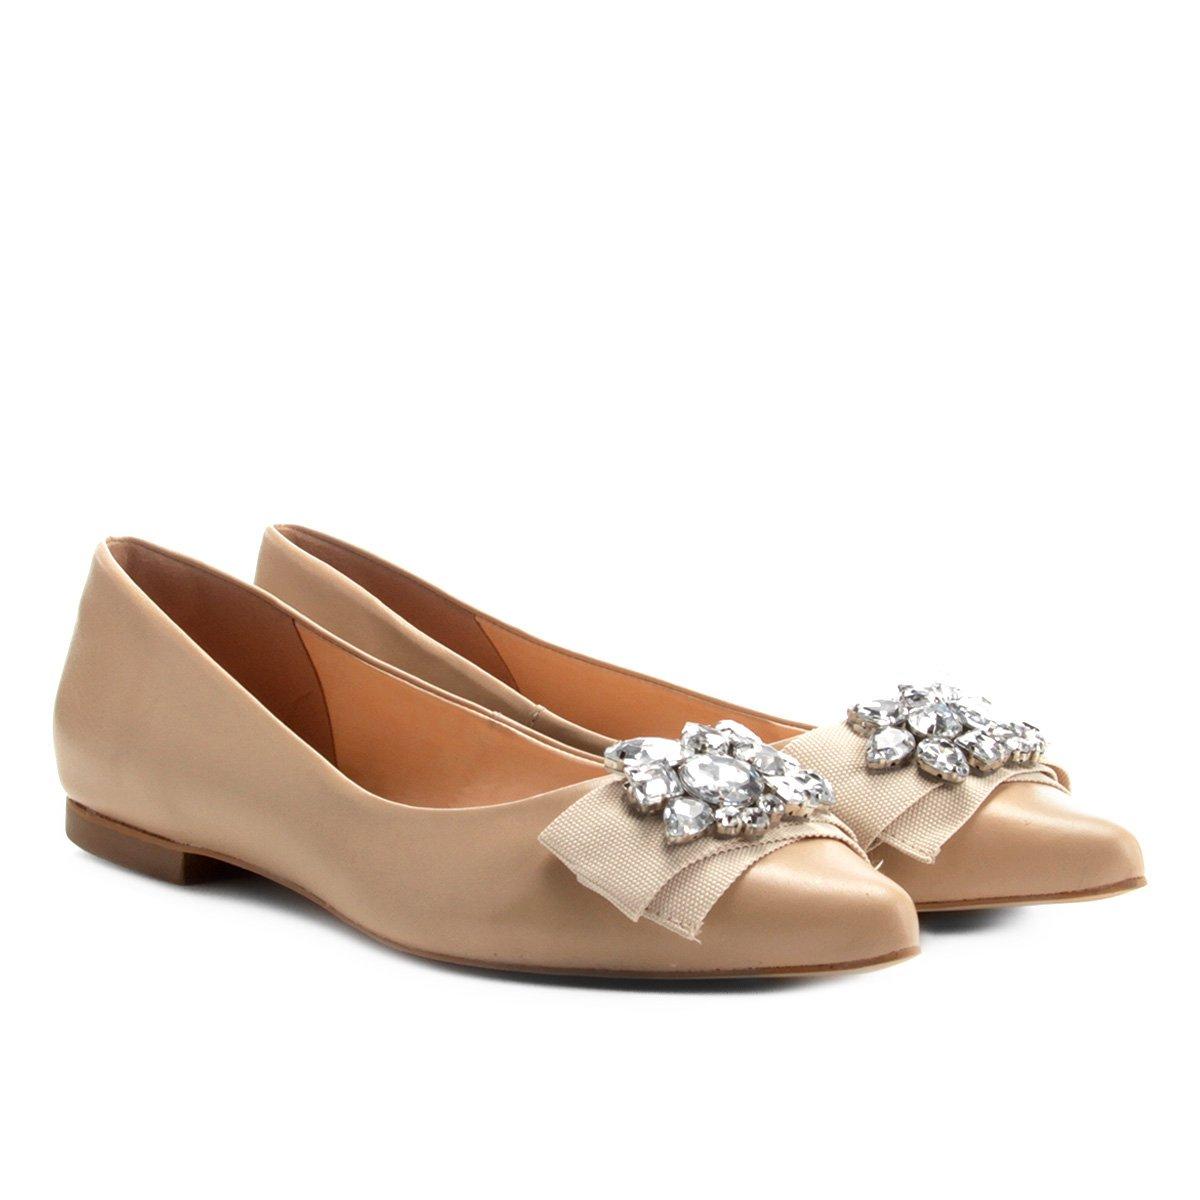 9f94b8533e Sapatilha Couro Shoestock Bico Fino Cristal Feminina